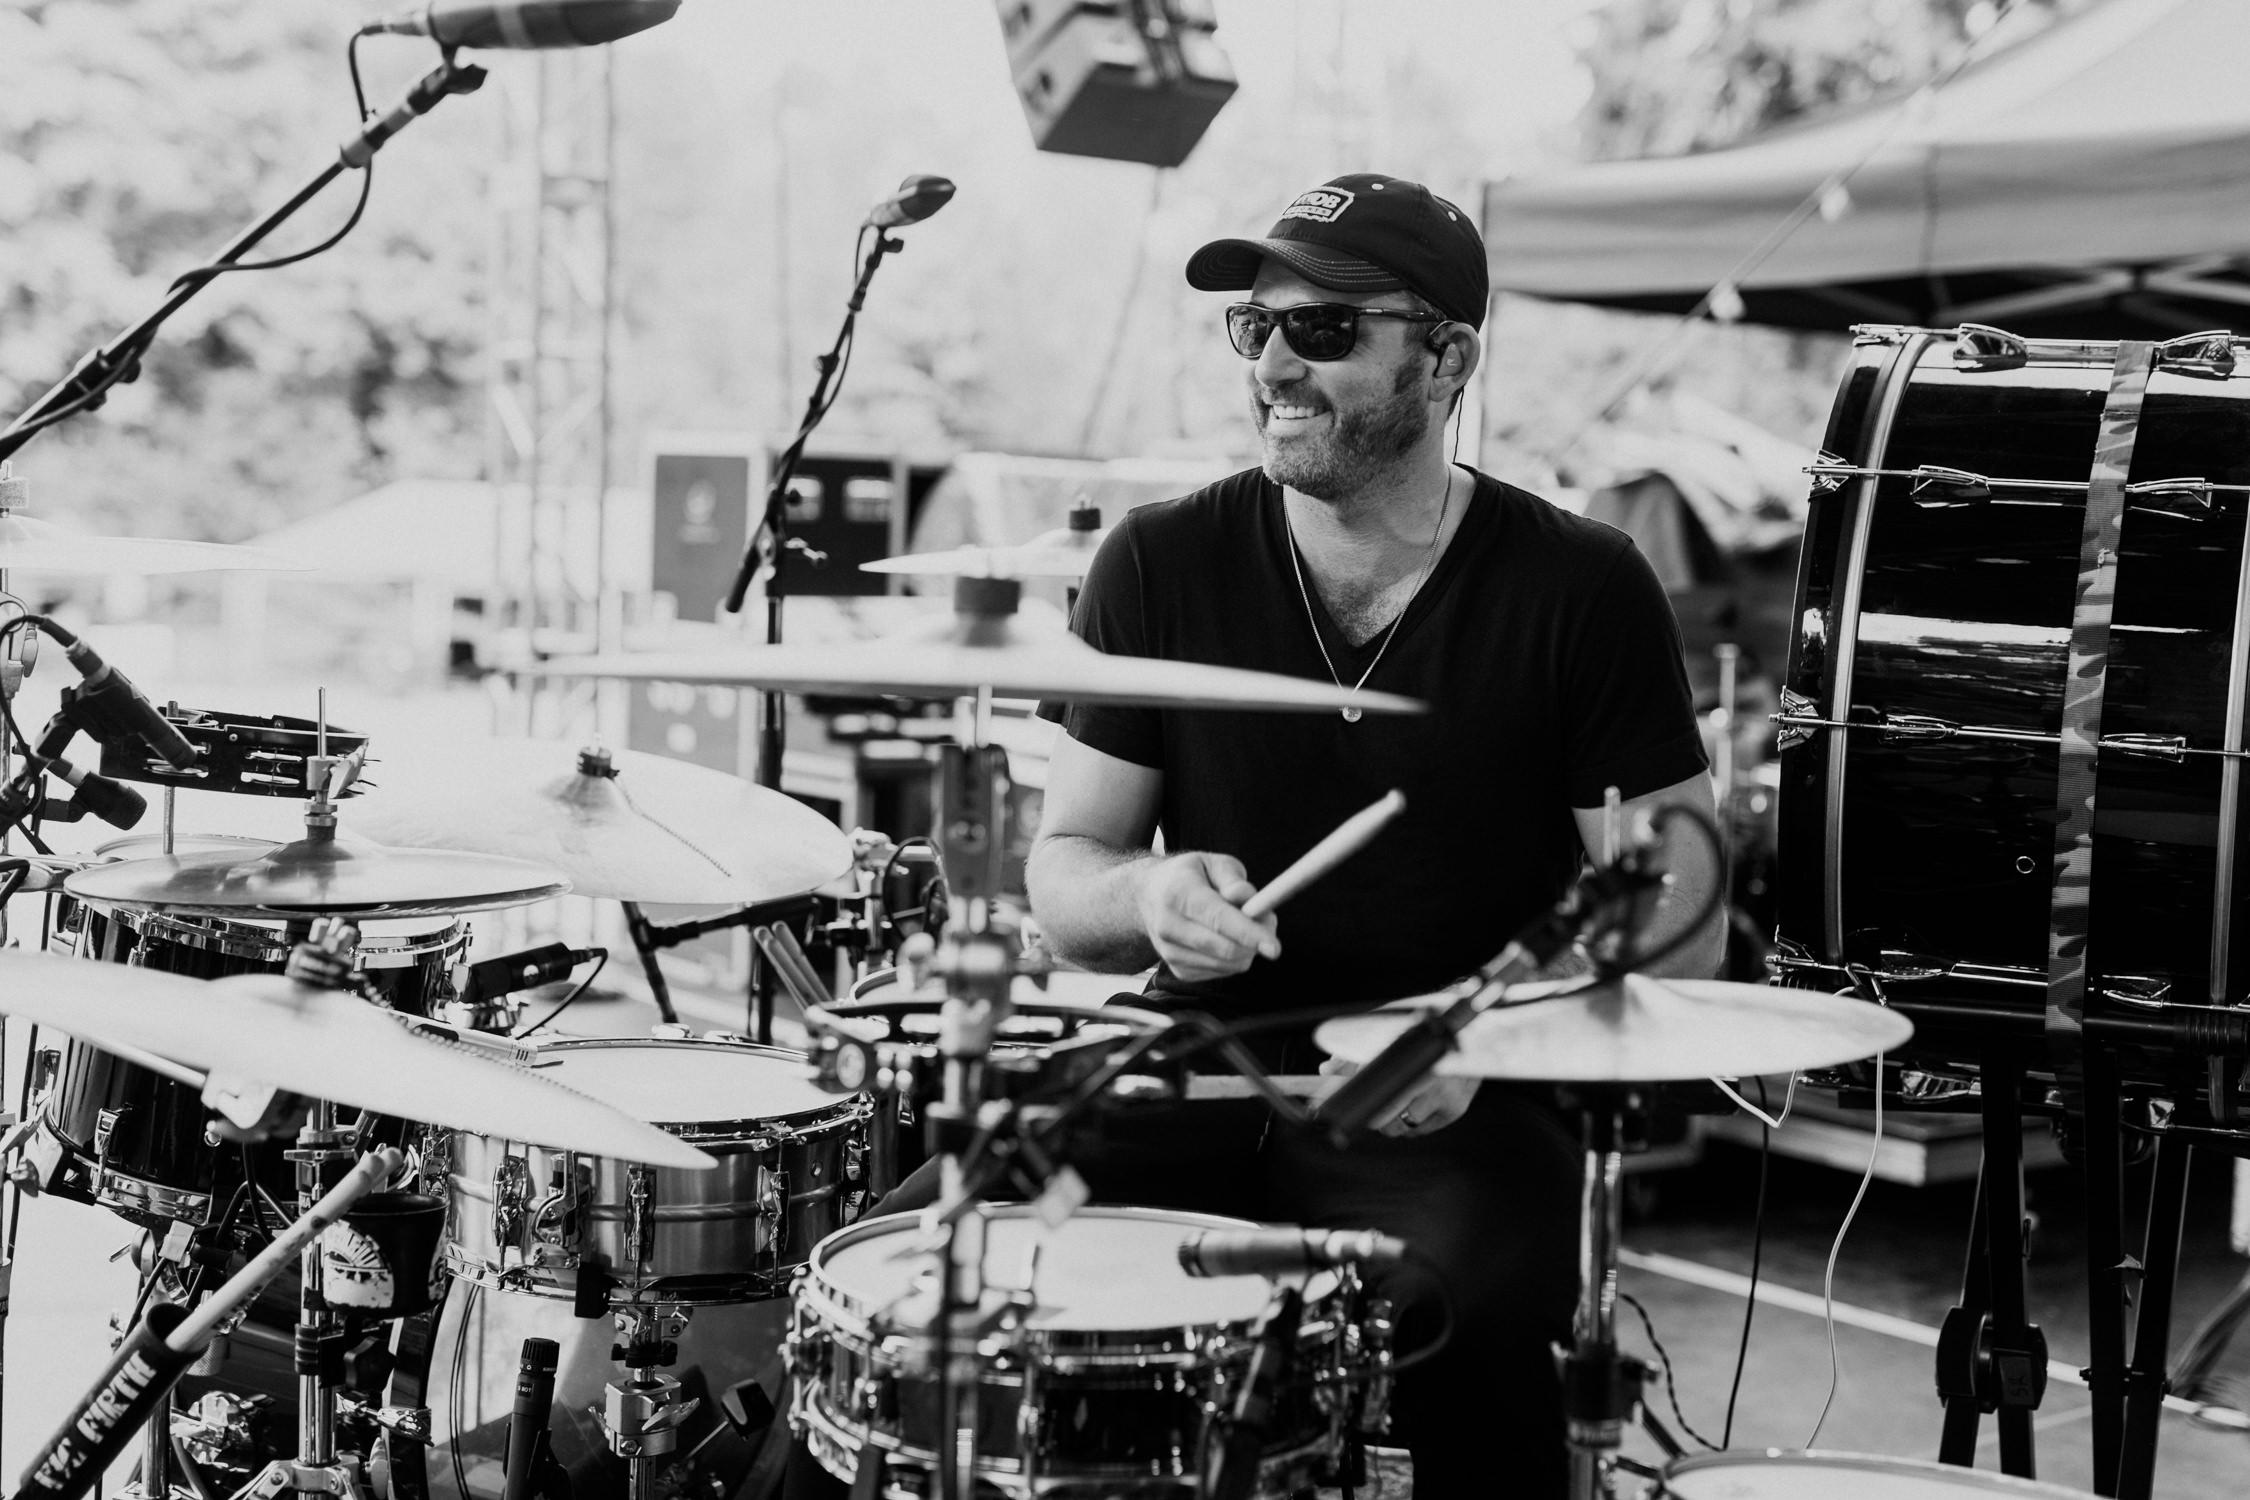 michael-baker-drums-gavin-degraw-AnnaLeeMedia